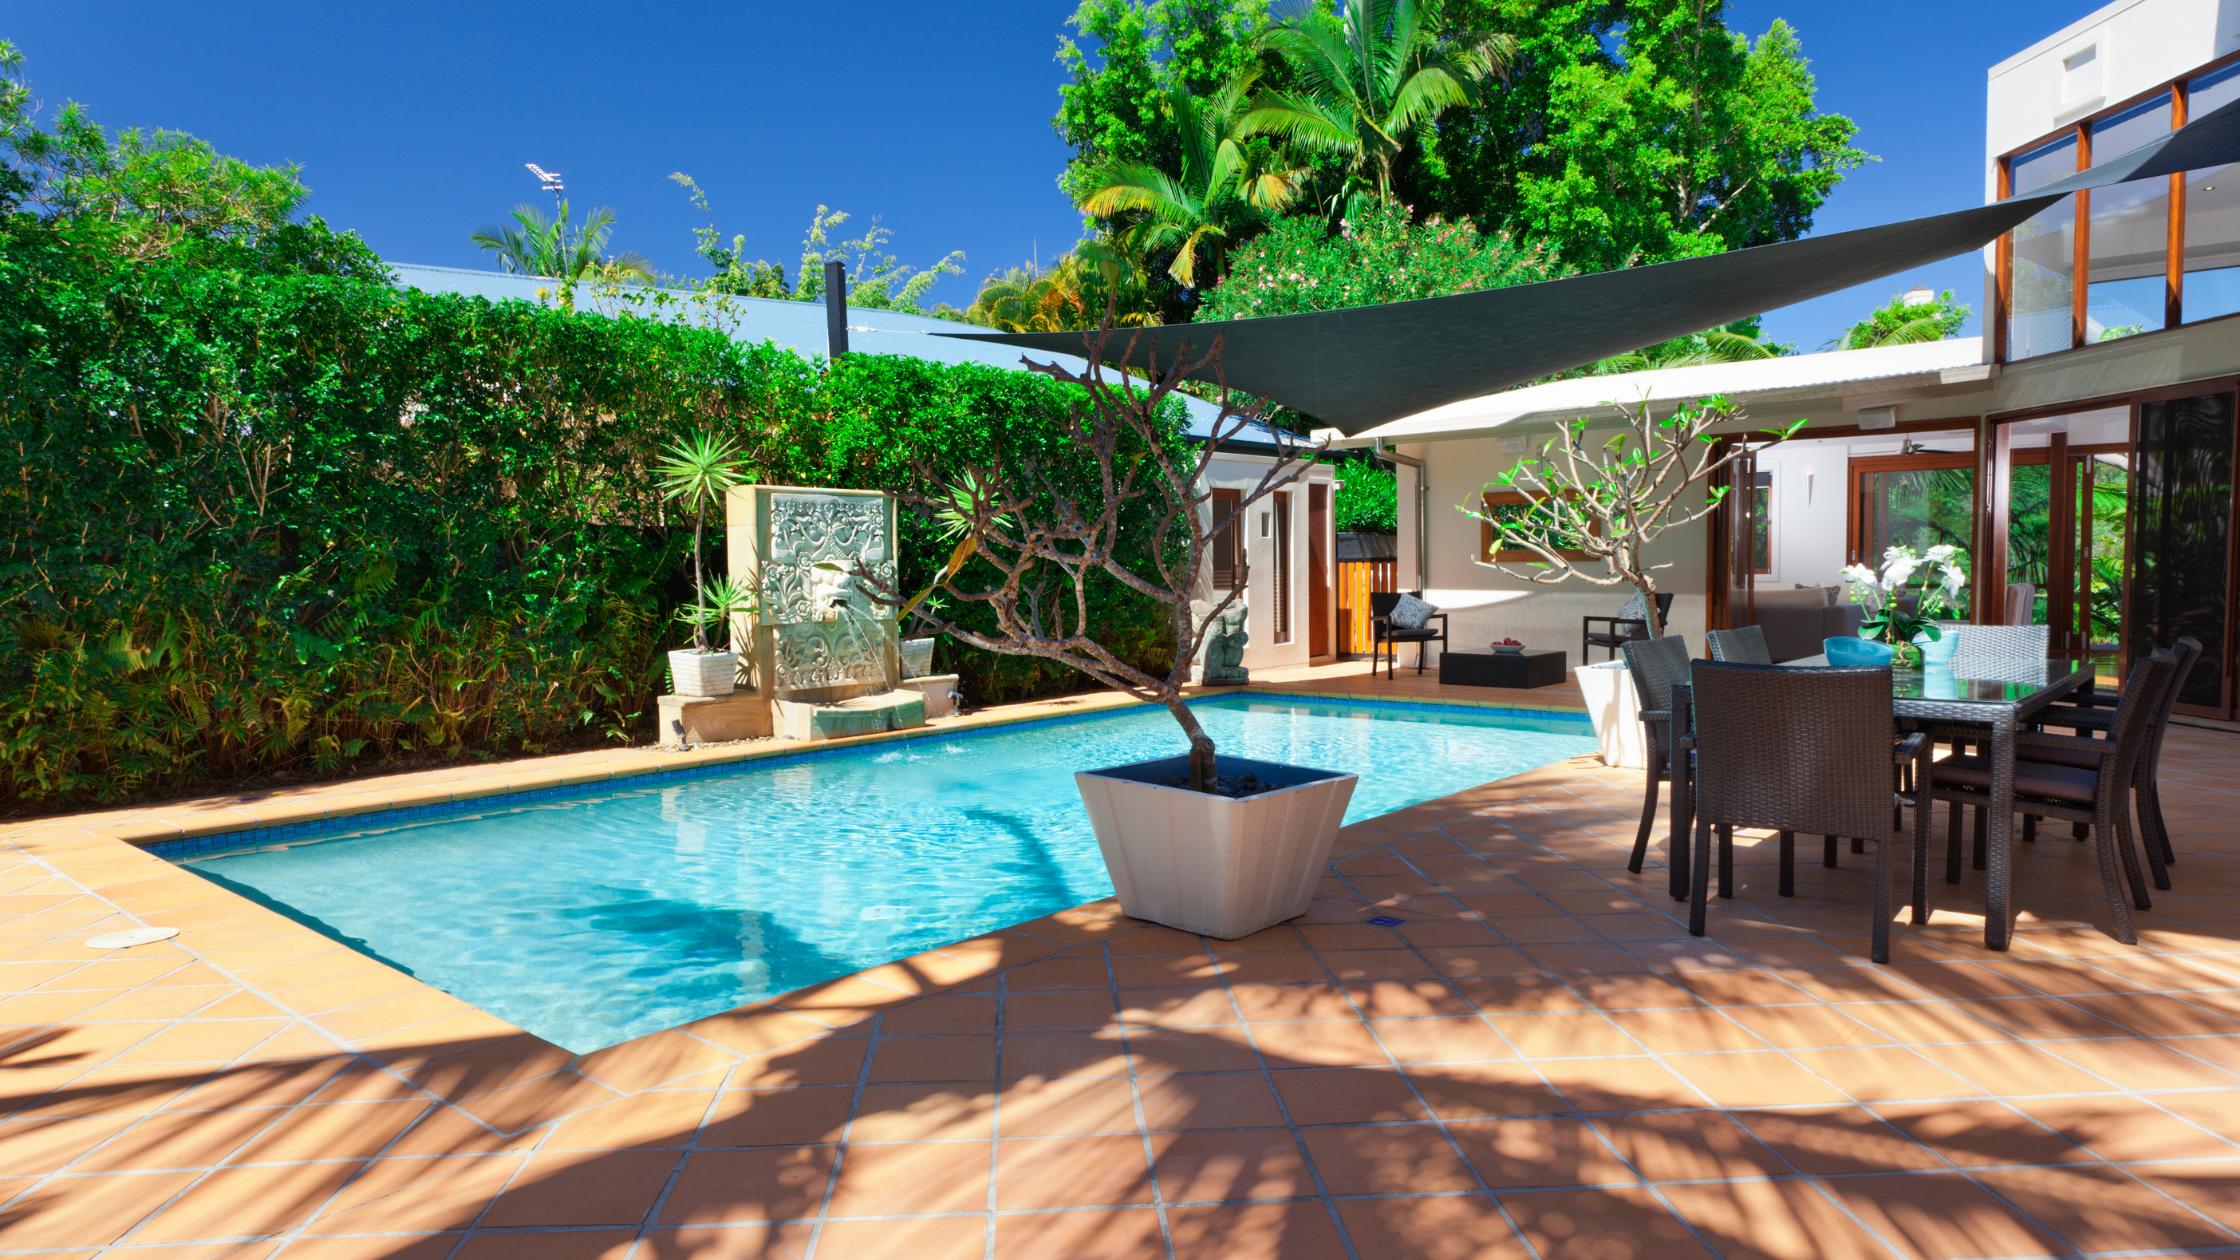 beautiful backyard with a pool